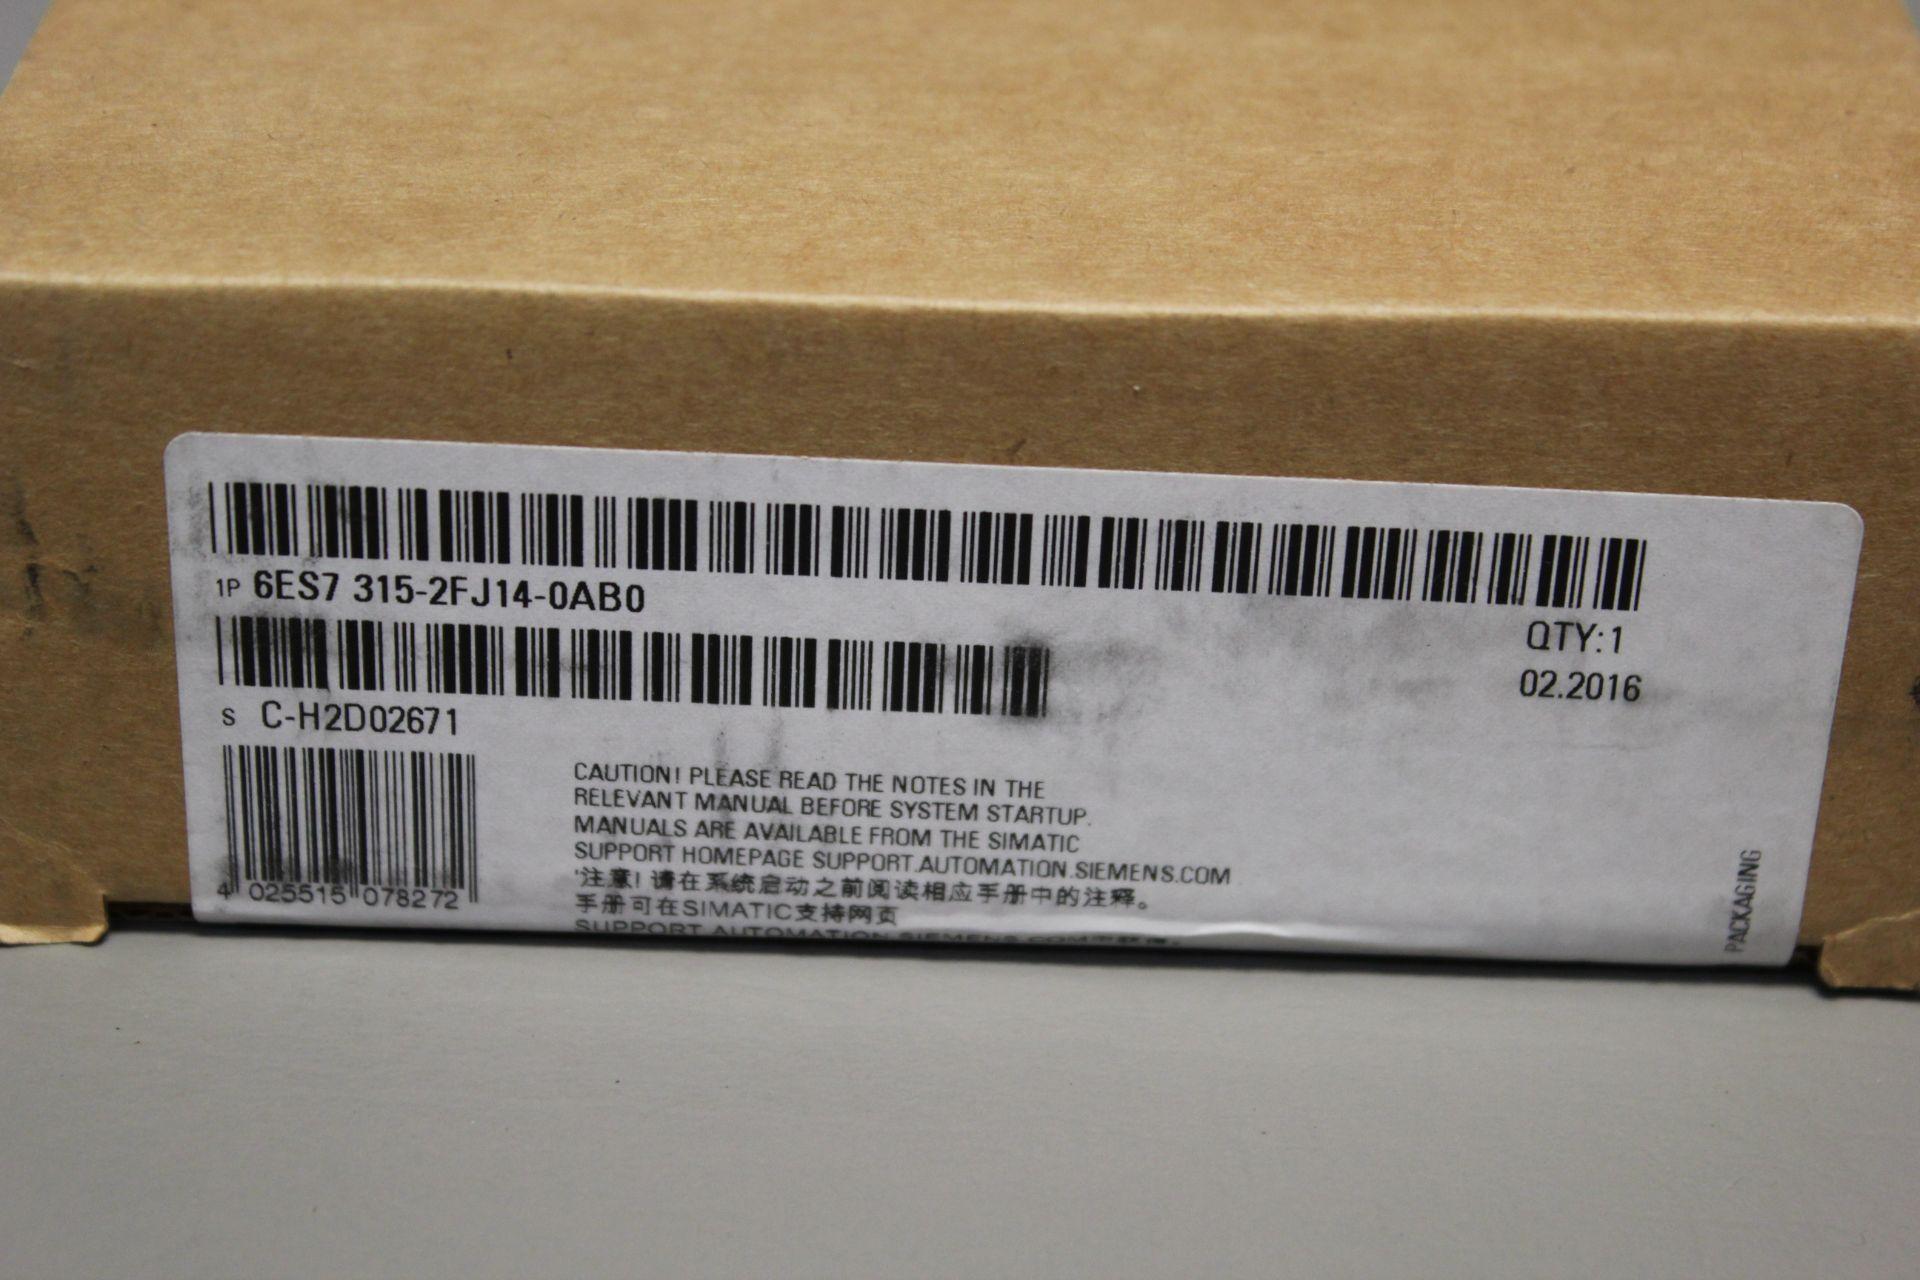 NEW SIEMENS SIMATIC S7-300 PLC CPU PROCESSOR - Image 2 of 3